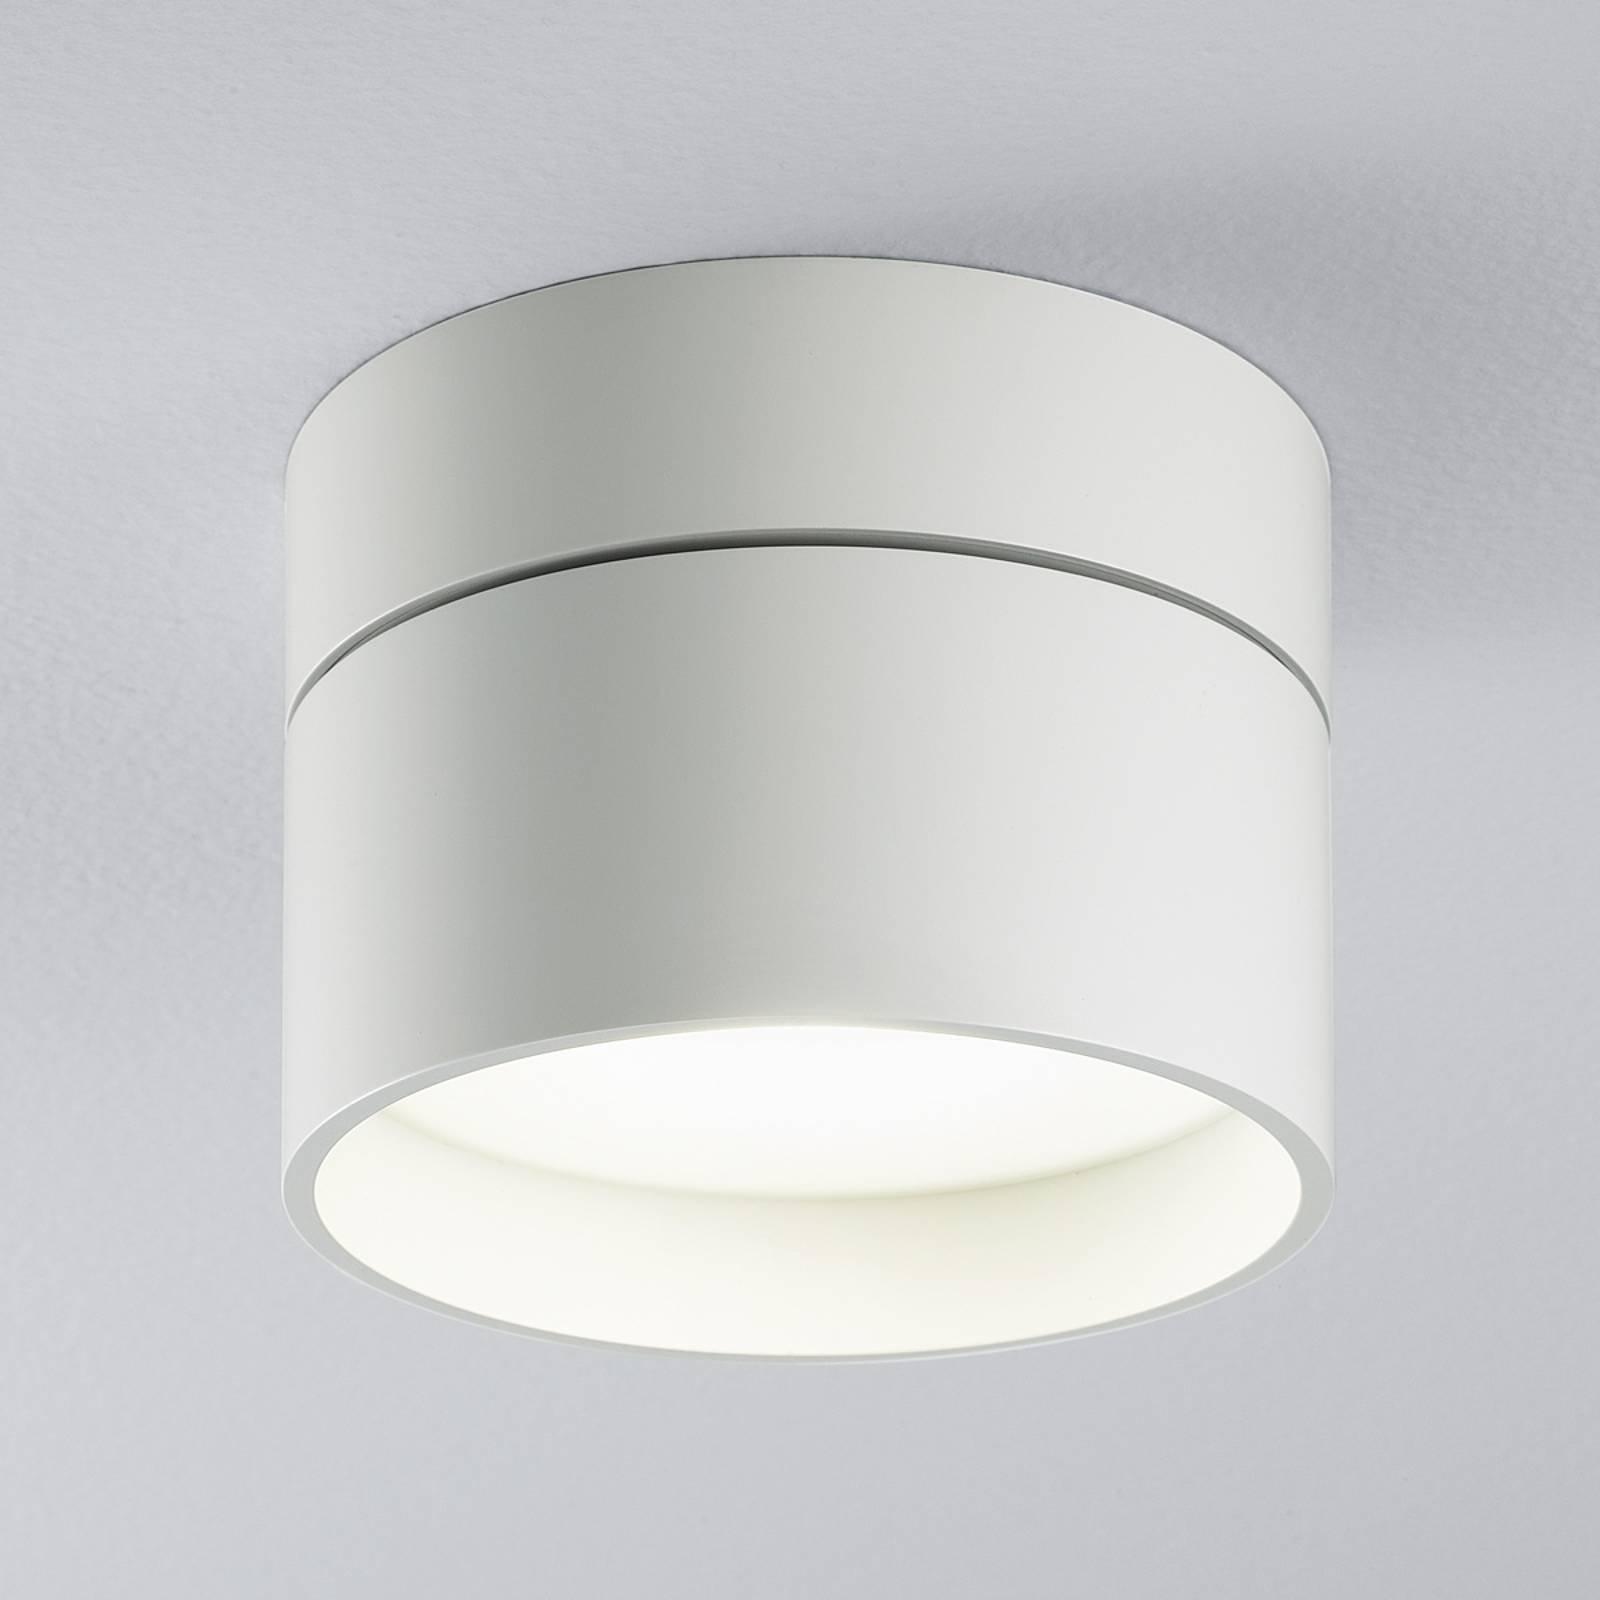 LED-taklampe Piper, 15 cm